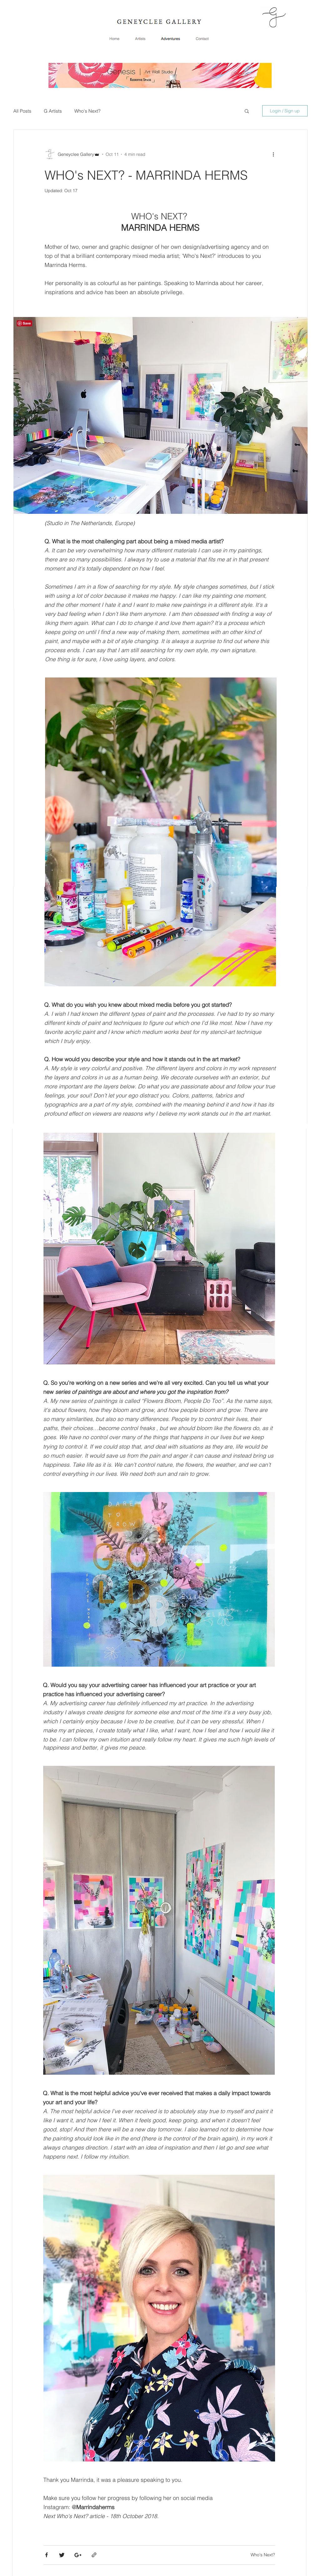 Interview Marrinda Herms with Geneyclee art Gallery Hong Kong